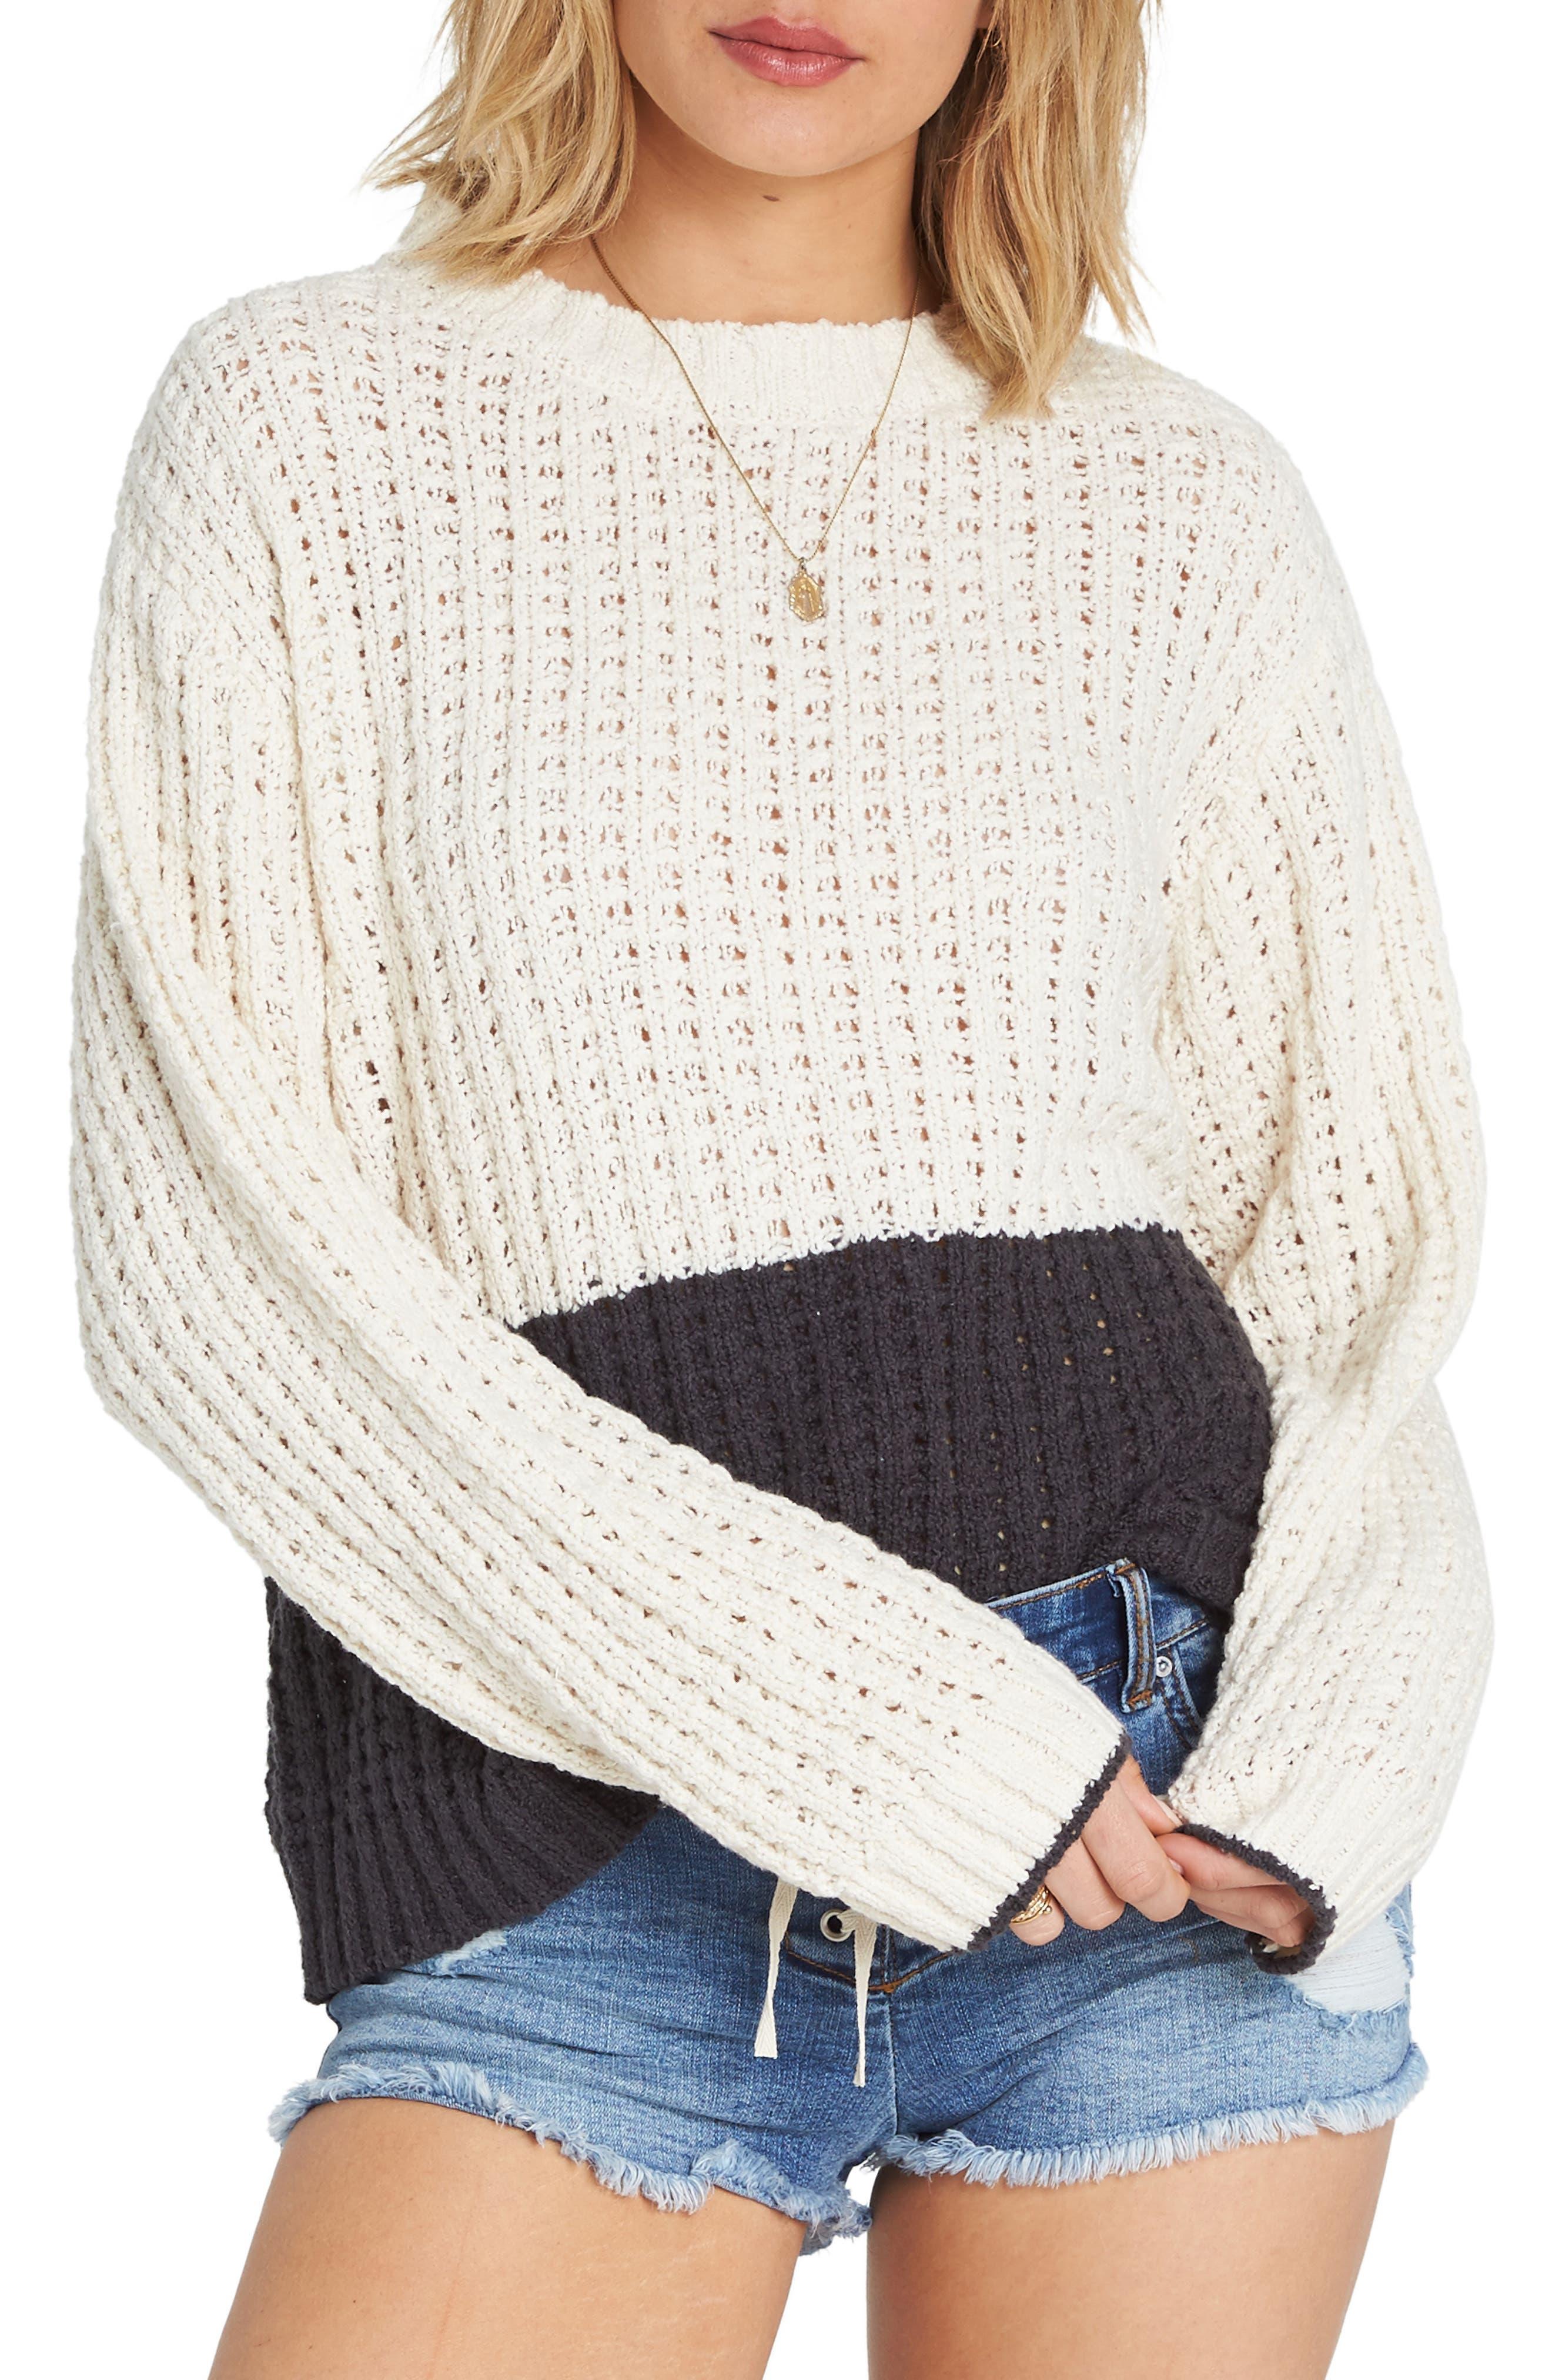 BILLABONG Block Party Colorblock Sweater, Main, color, 001